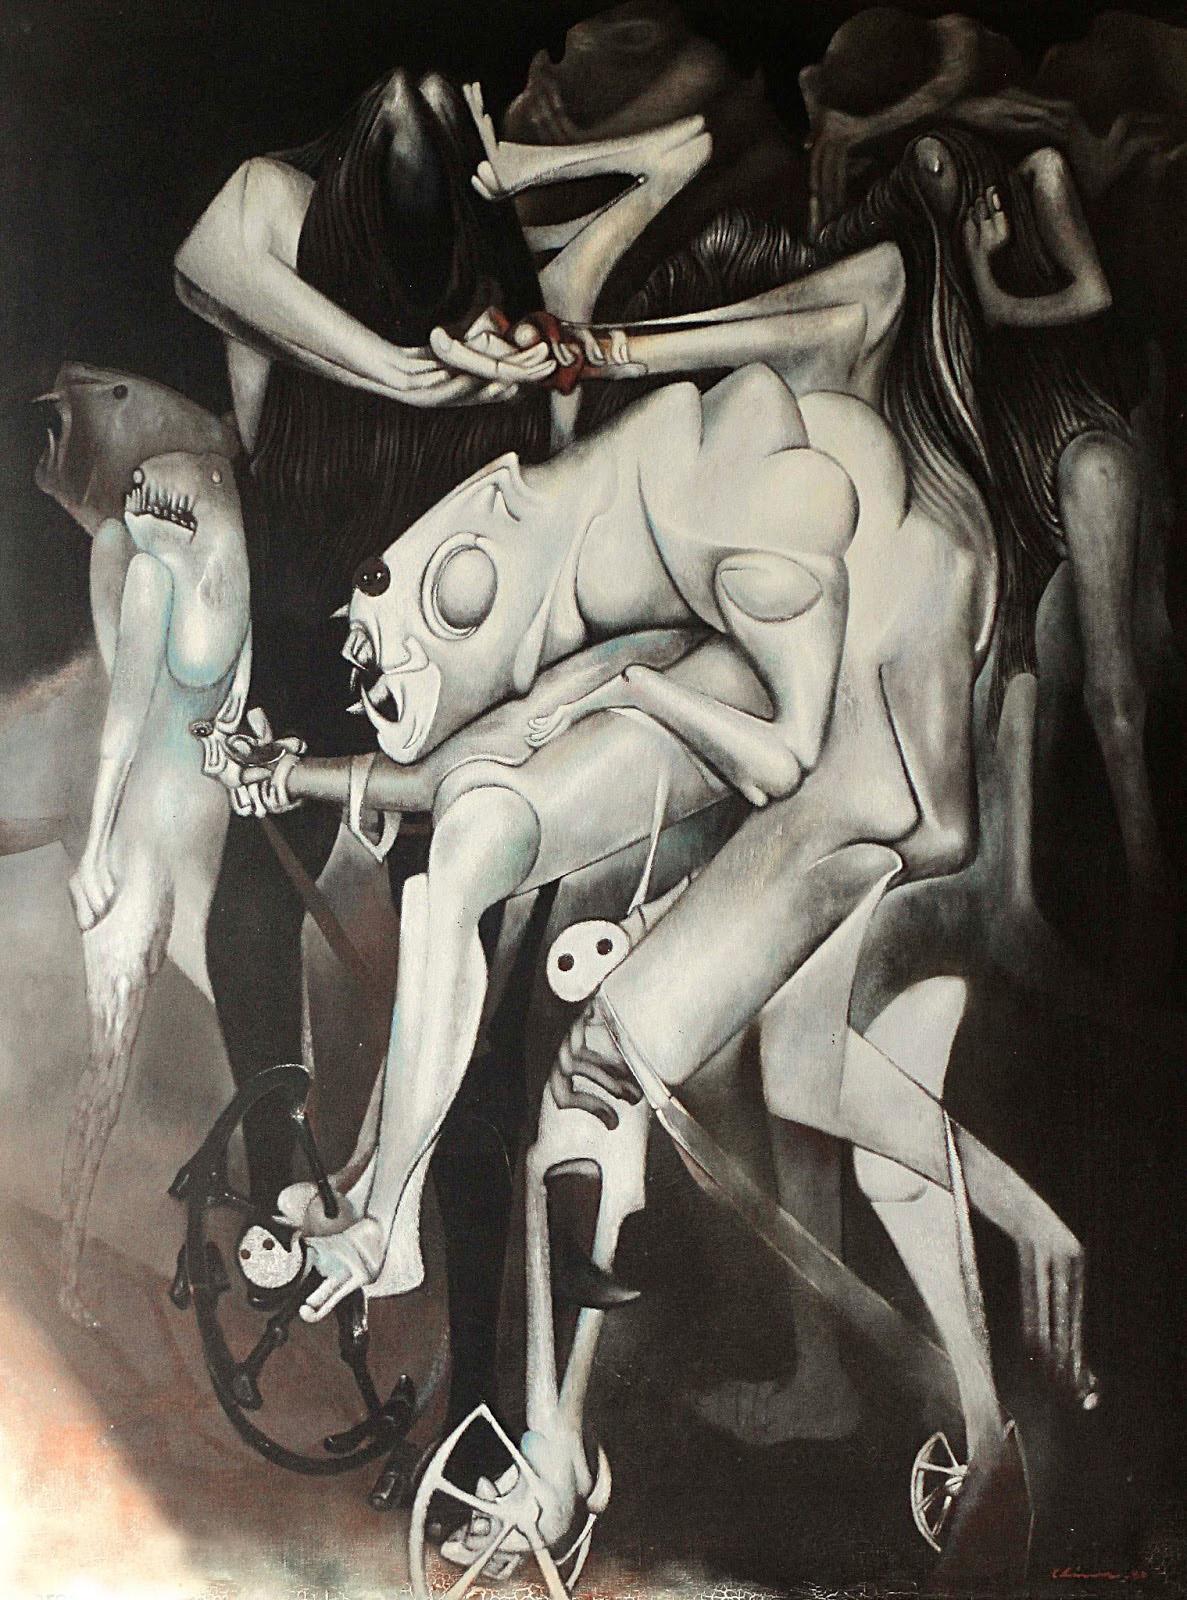 Gerardo Chavez Lopez - Walker in the Dark, 1980